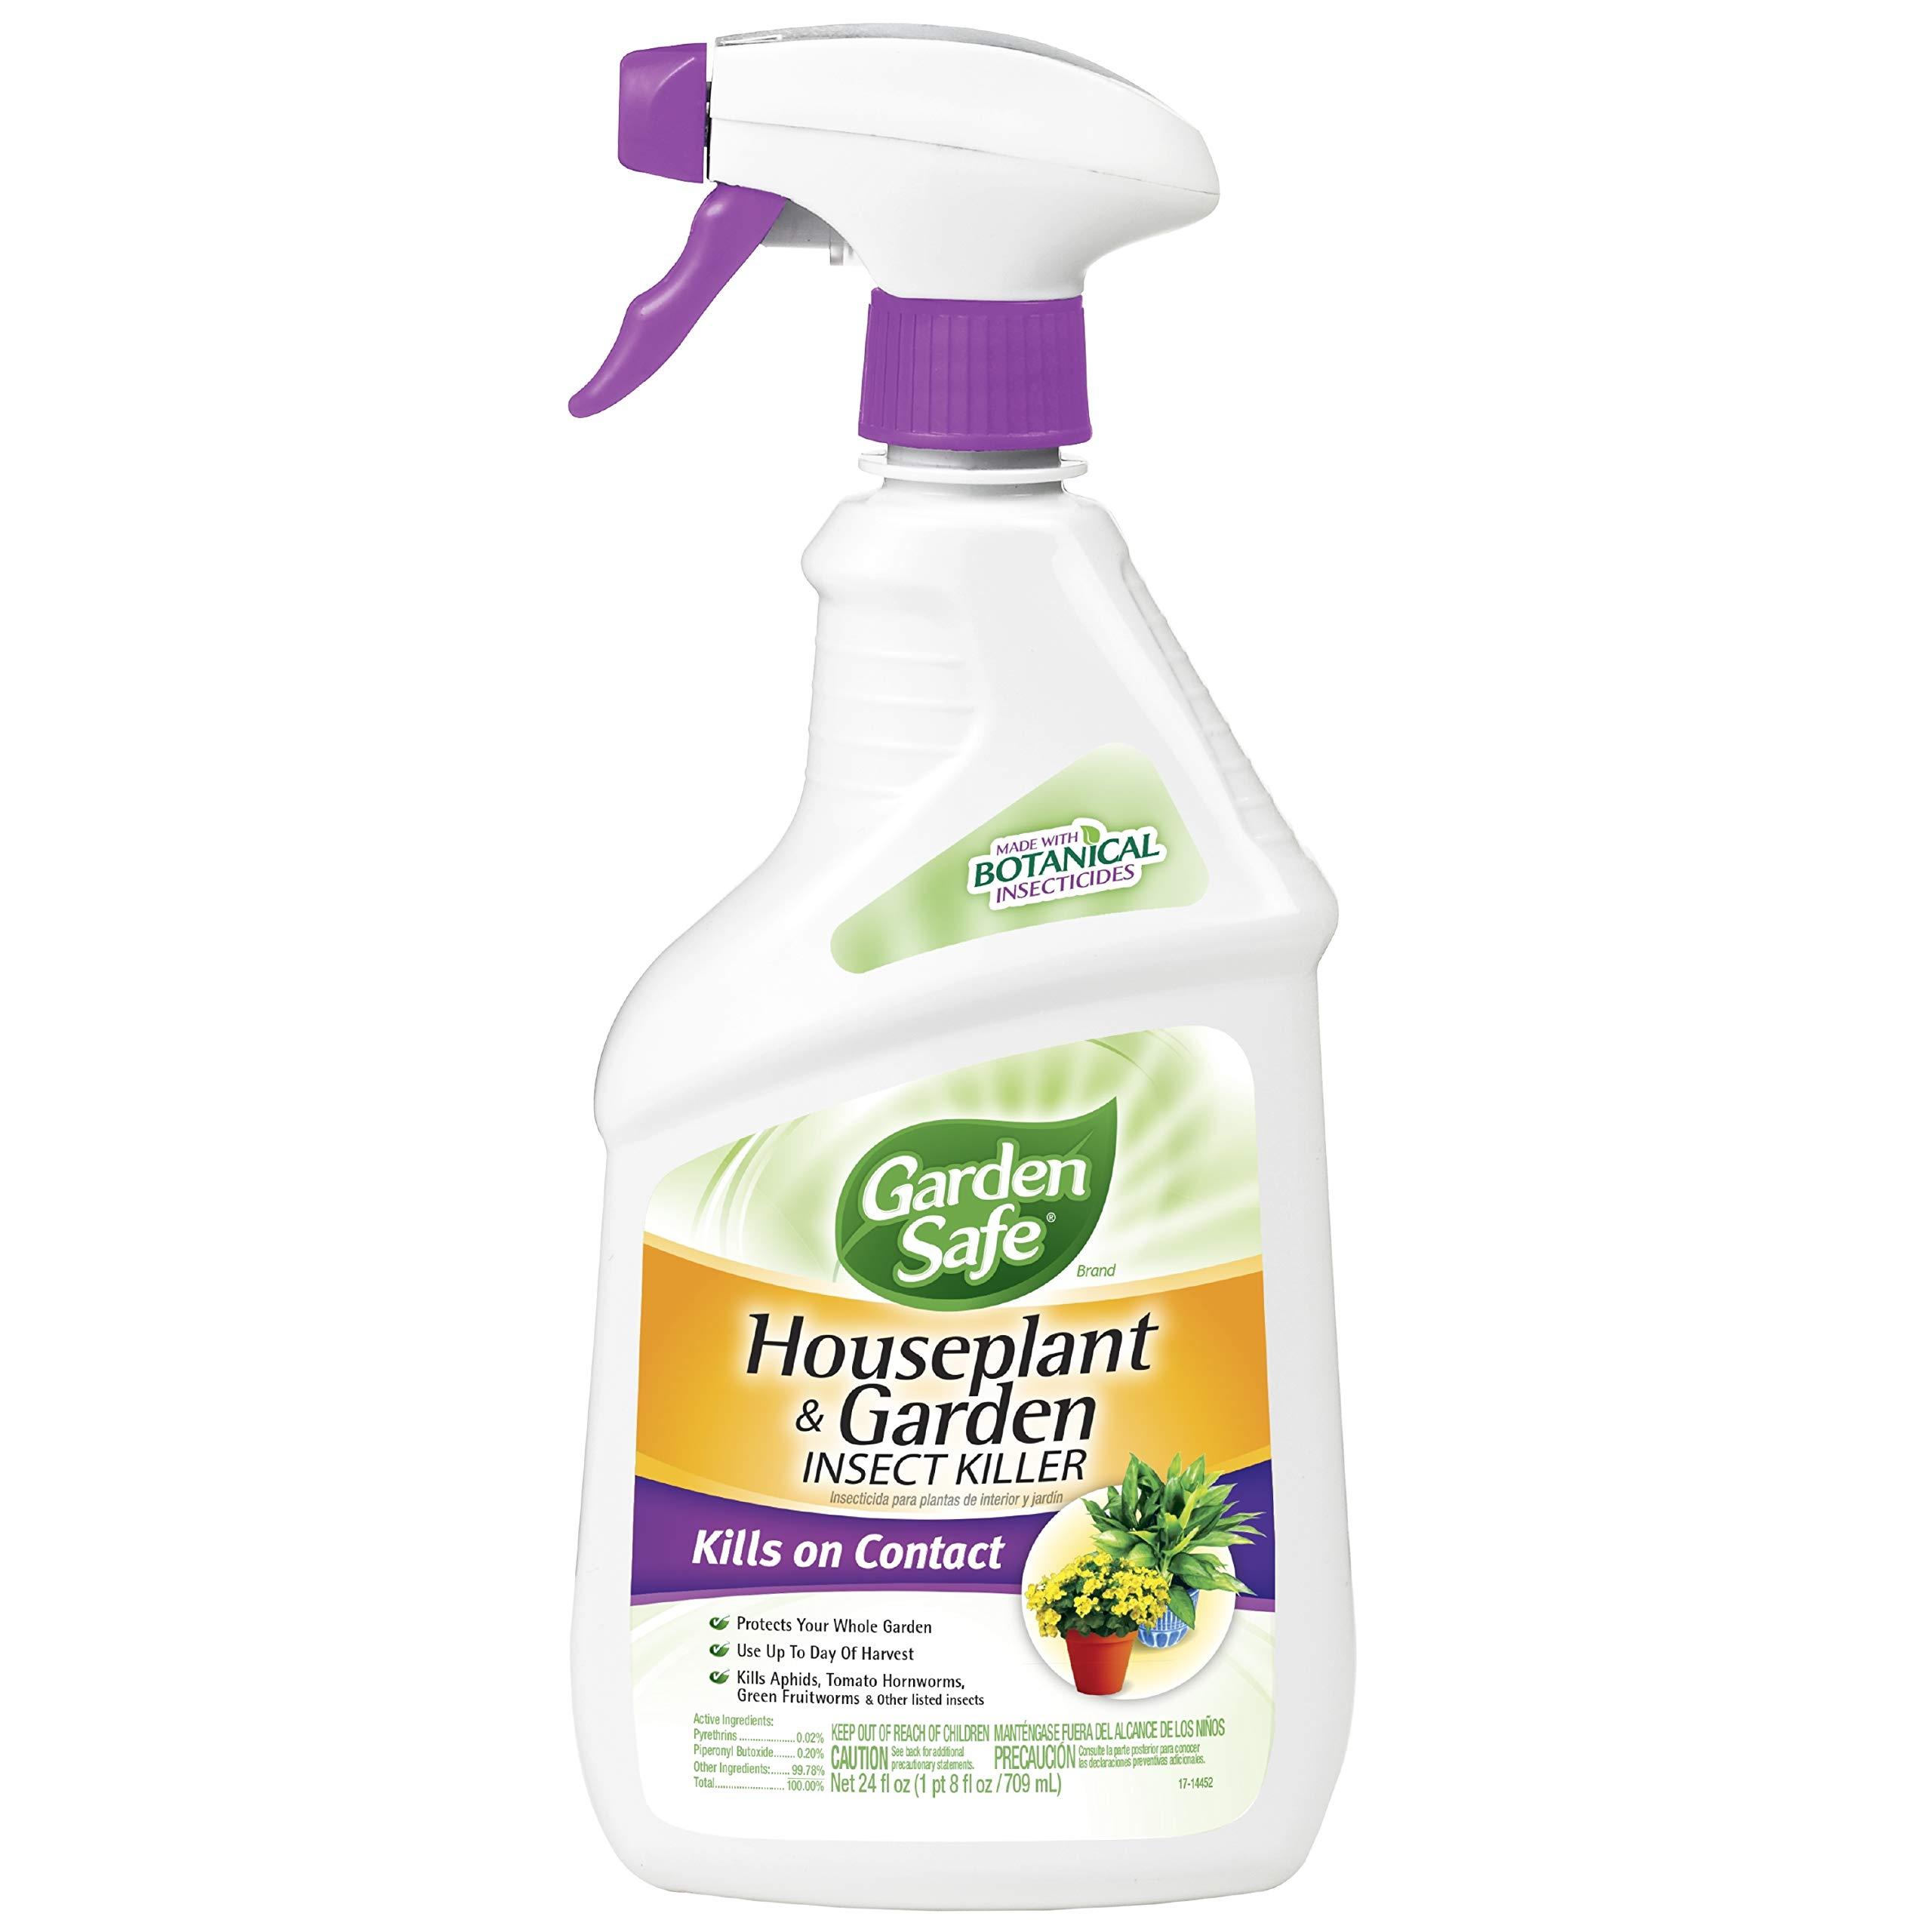 Garden Safe Brand Houseplant & Garden Insect Killer, Ready-to-Use, 24-Ounce, 4-Pack by Garden Safe